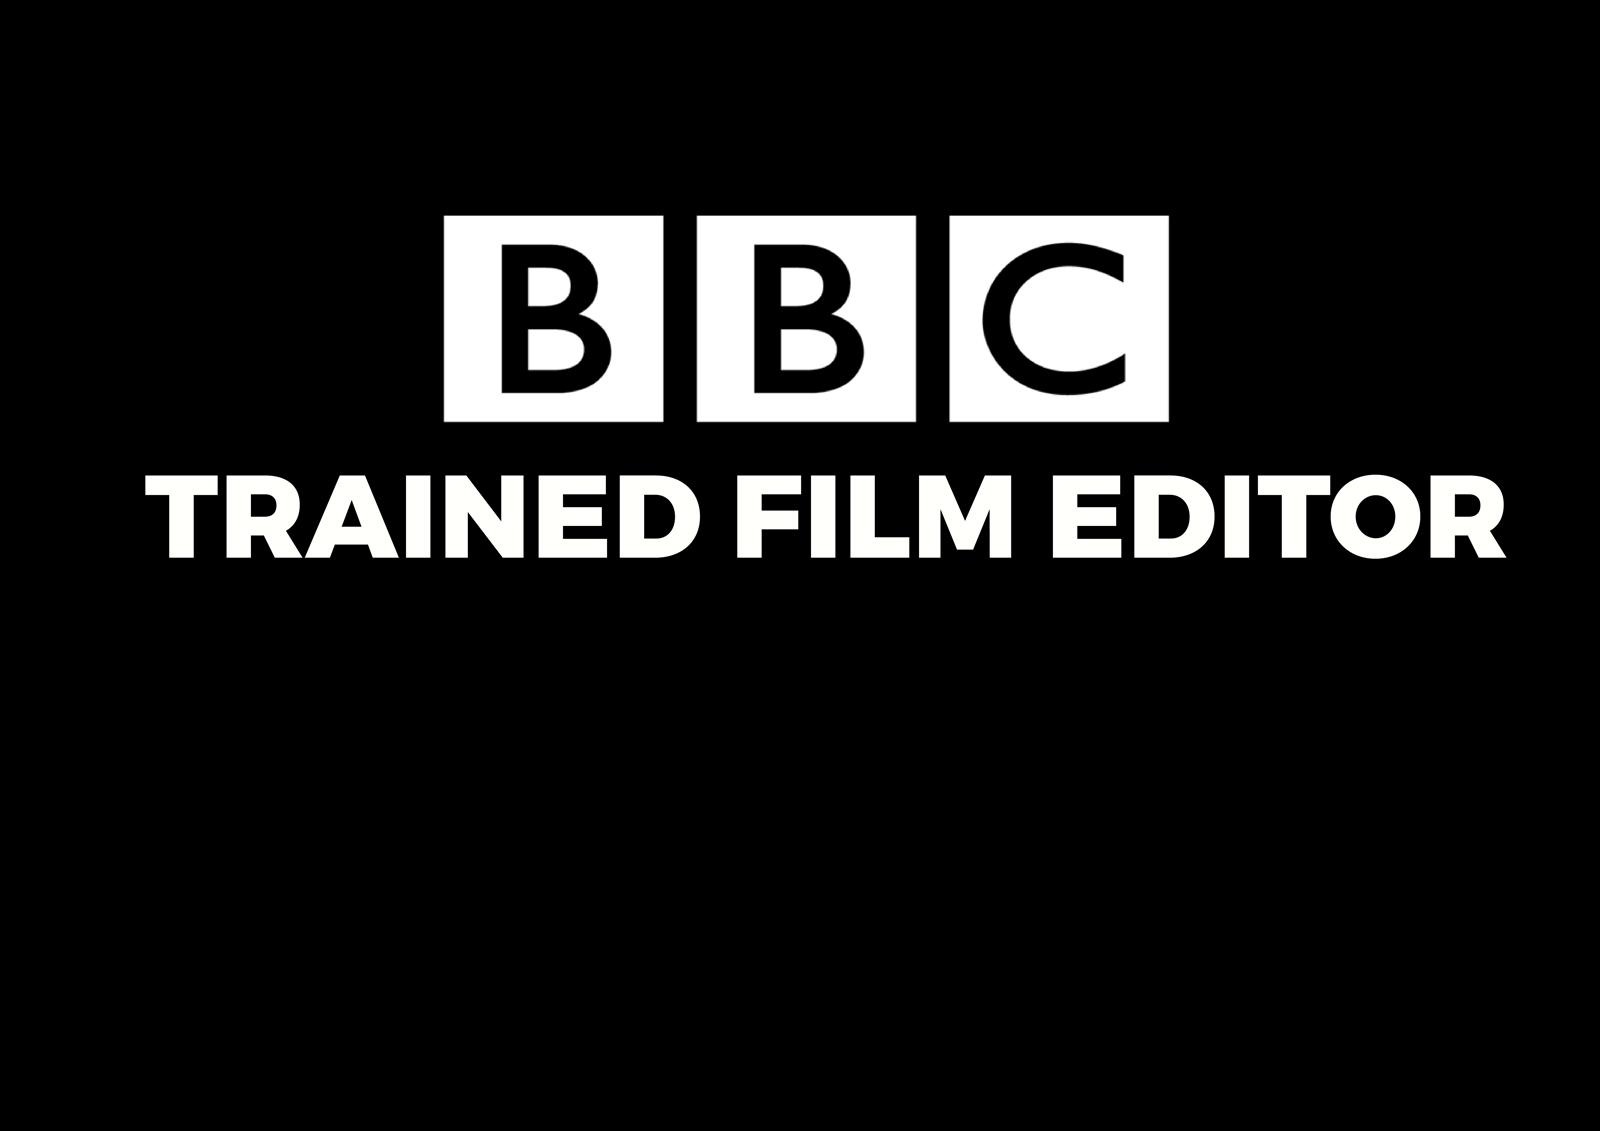 BBC TRAINED FILM EDITOR